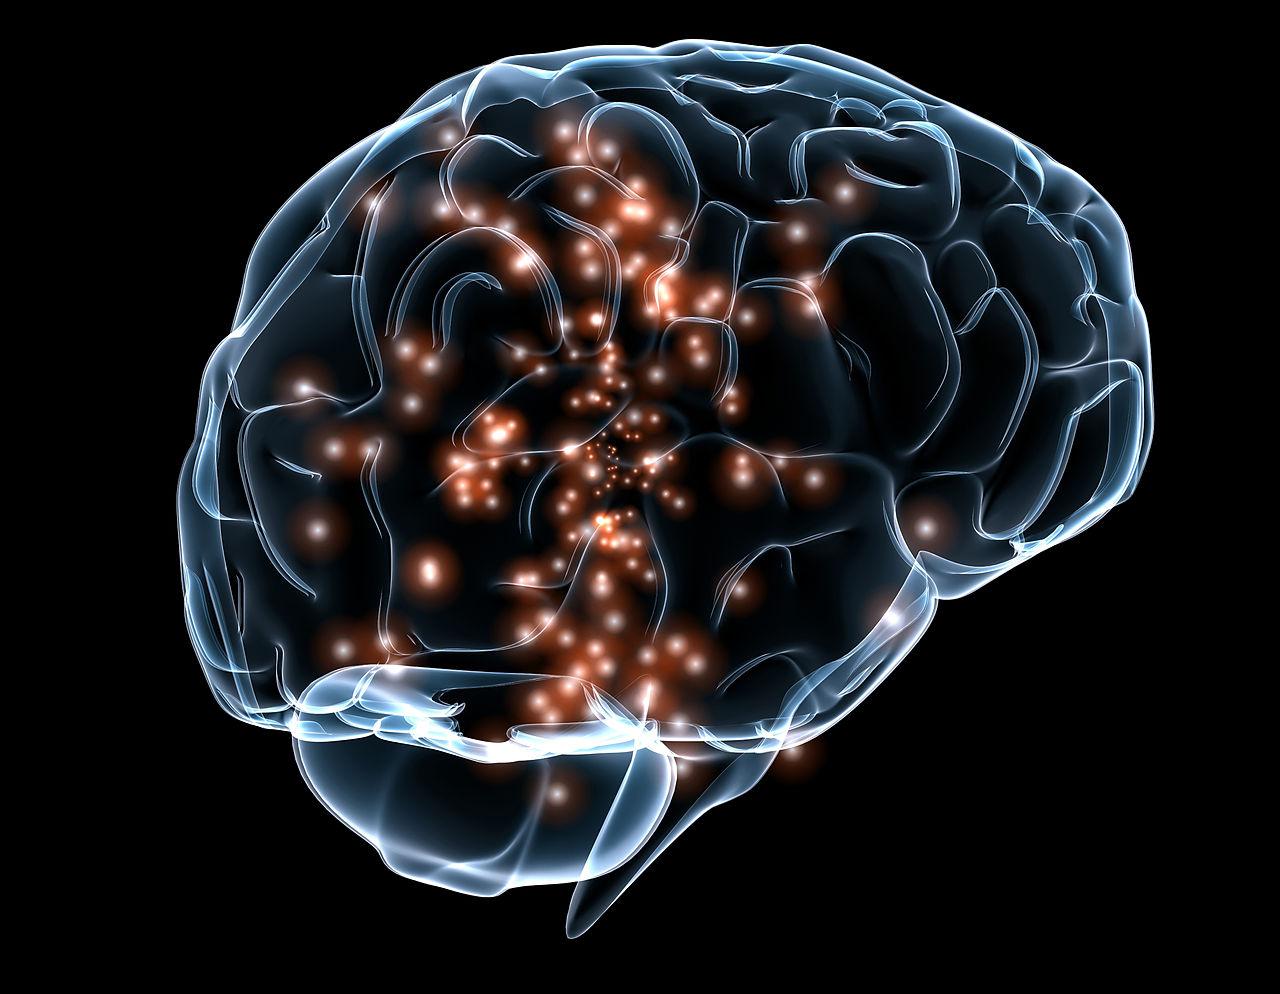 Ilustracion de la actividad neuronal en un cerebro humano. Fuente: Massachusetts General Hospital and Draper Labs